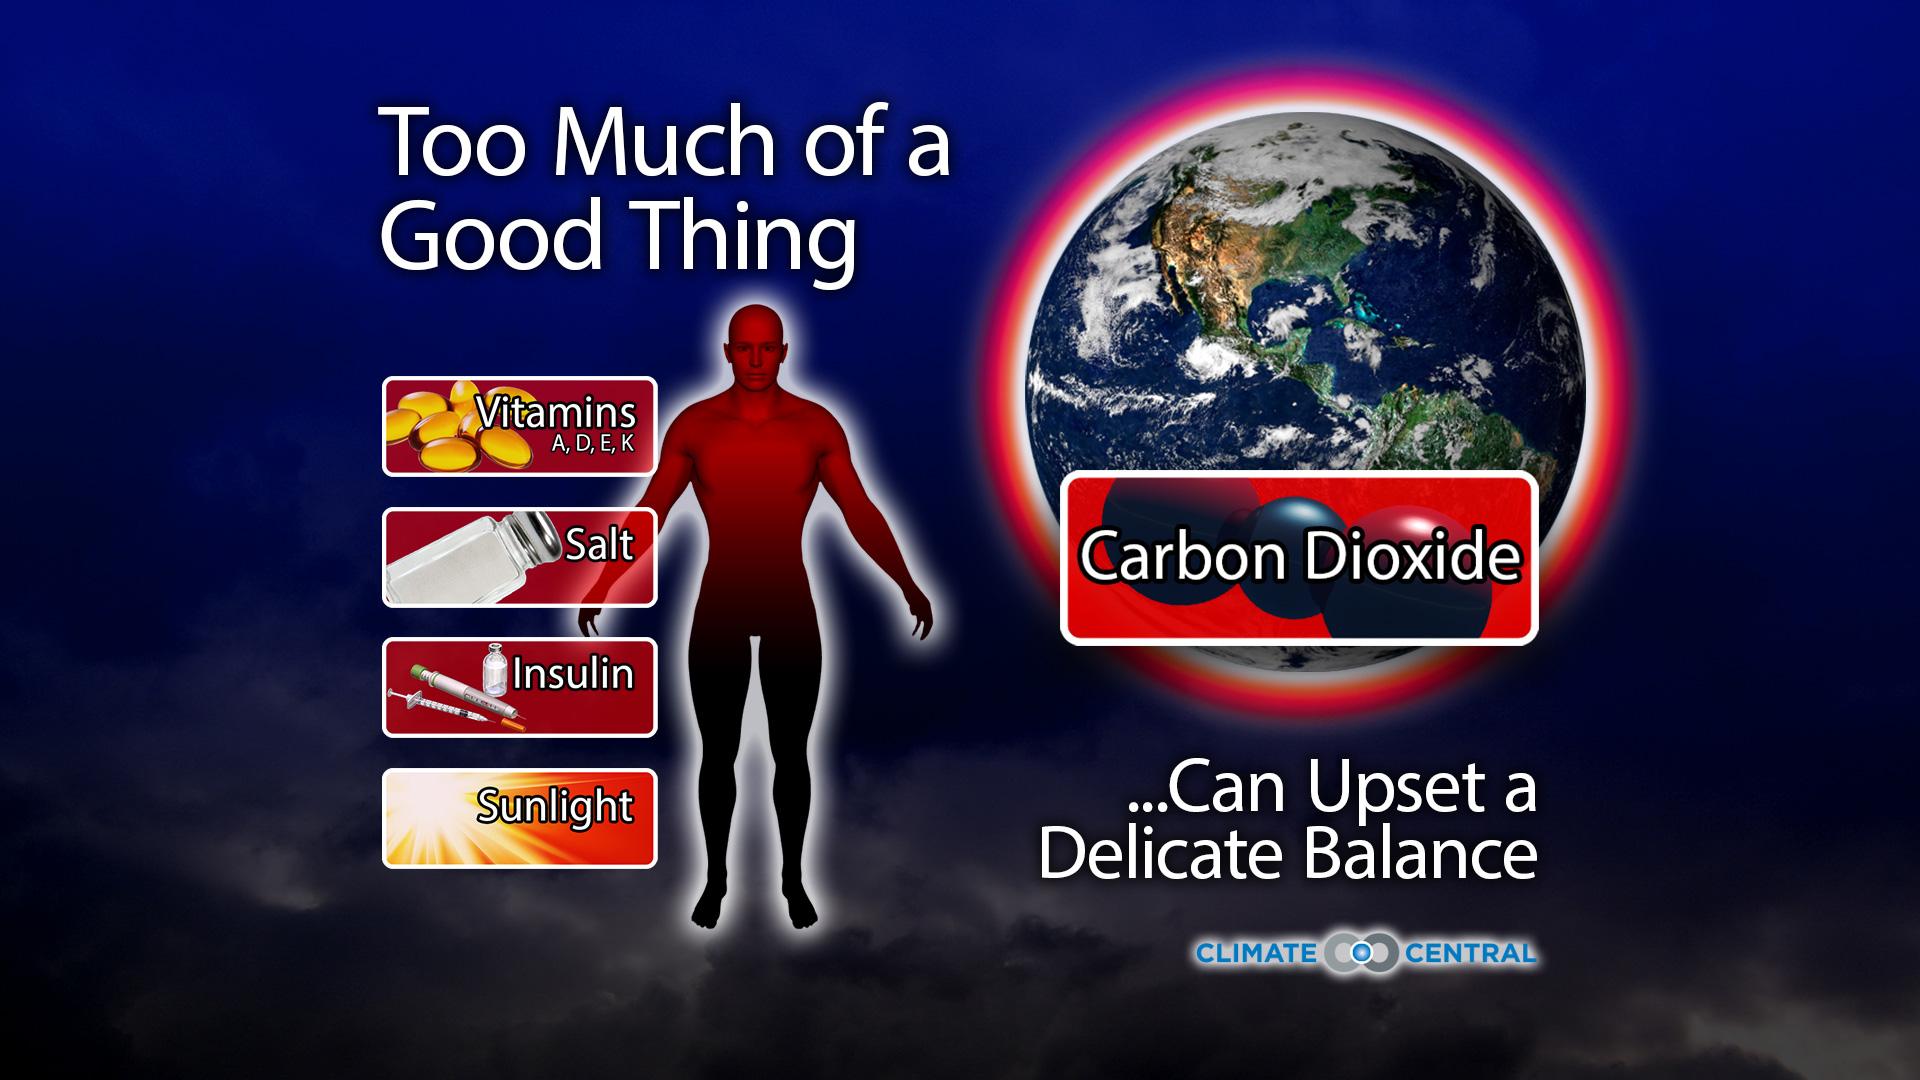 Isn't CO2 a Good Thing?